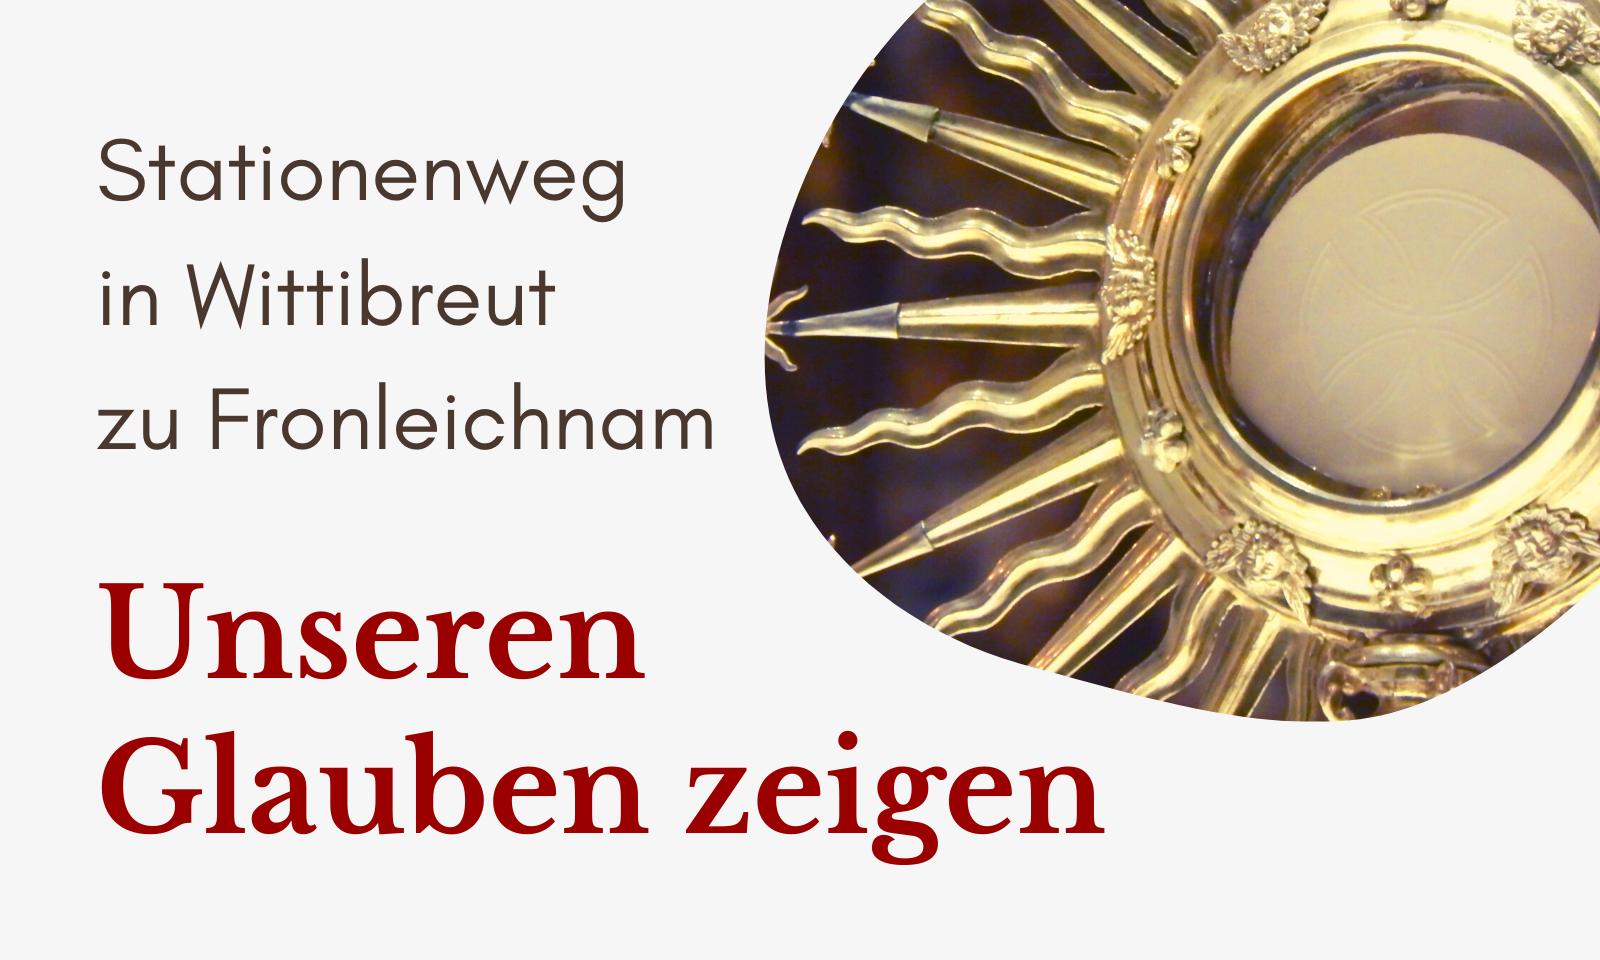 2021 05 Fronleichnamsweg Entry Image